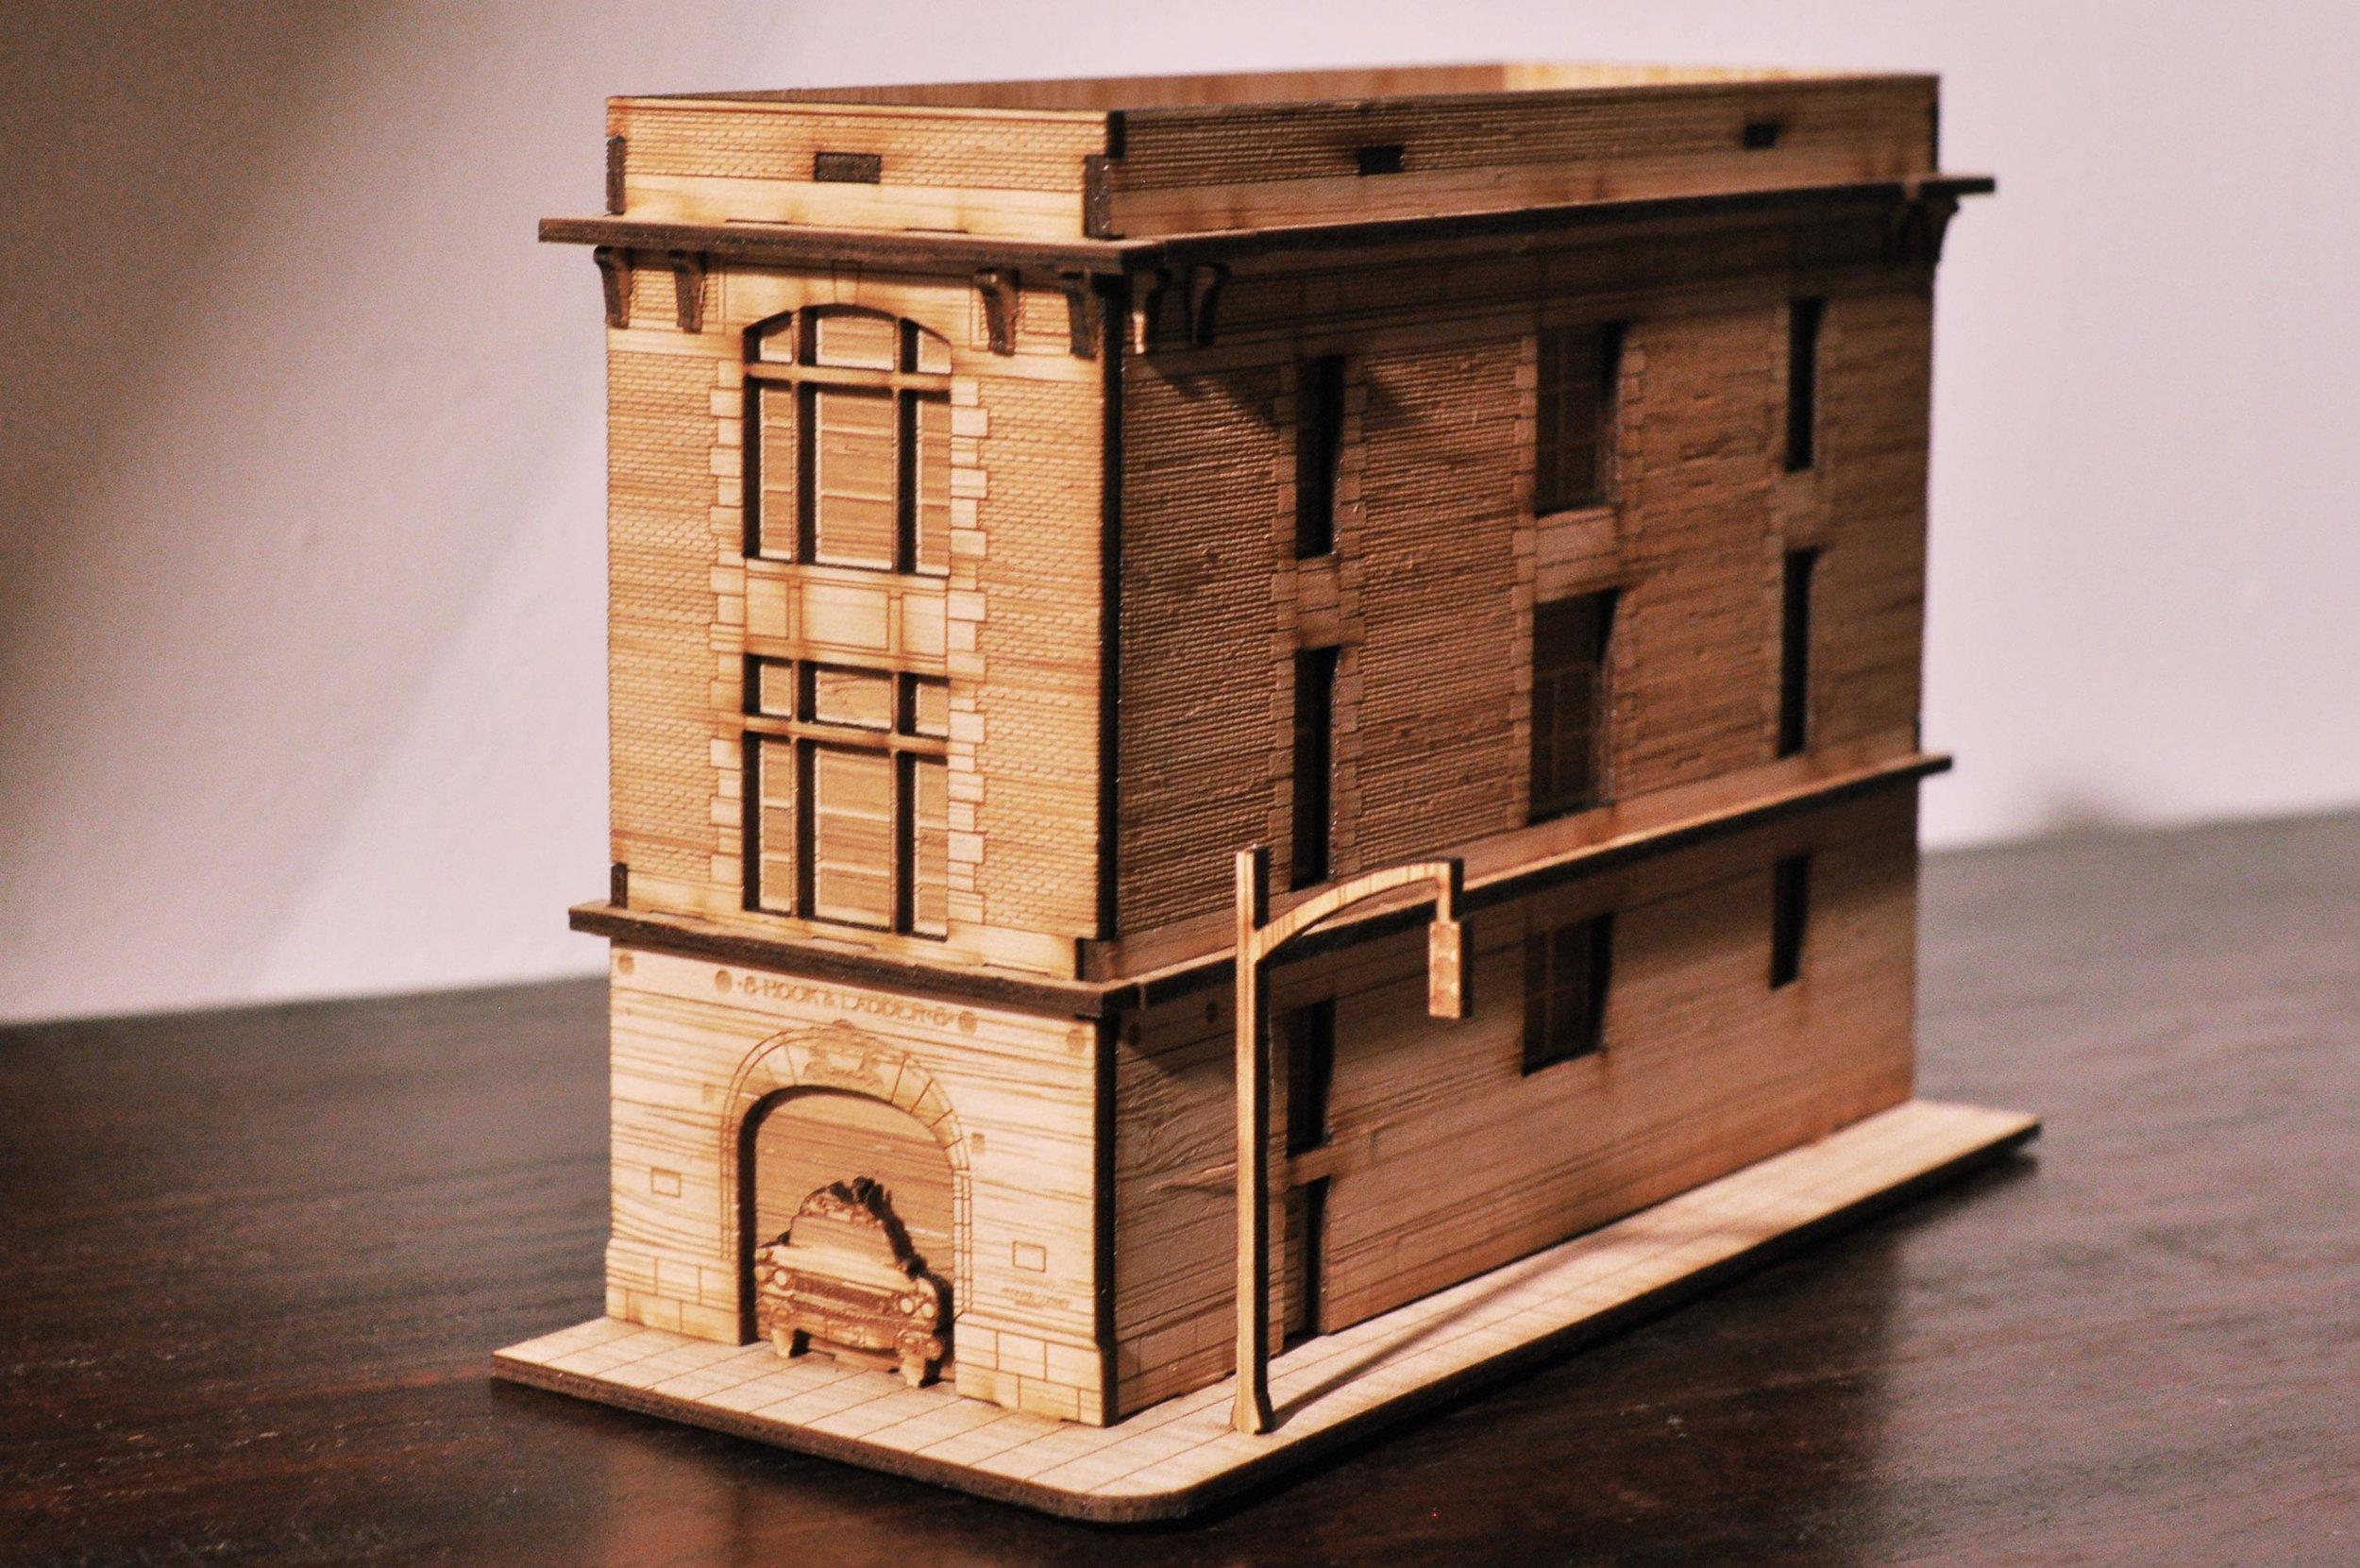 Ghostbusters HQ Model Kit